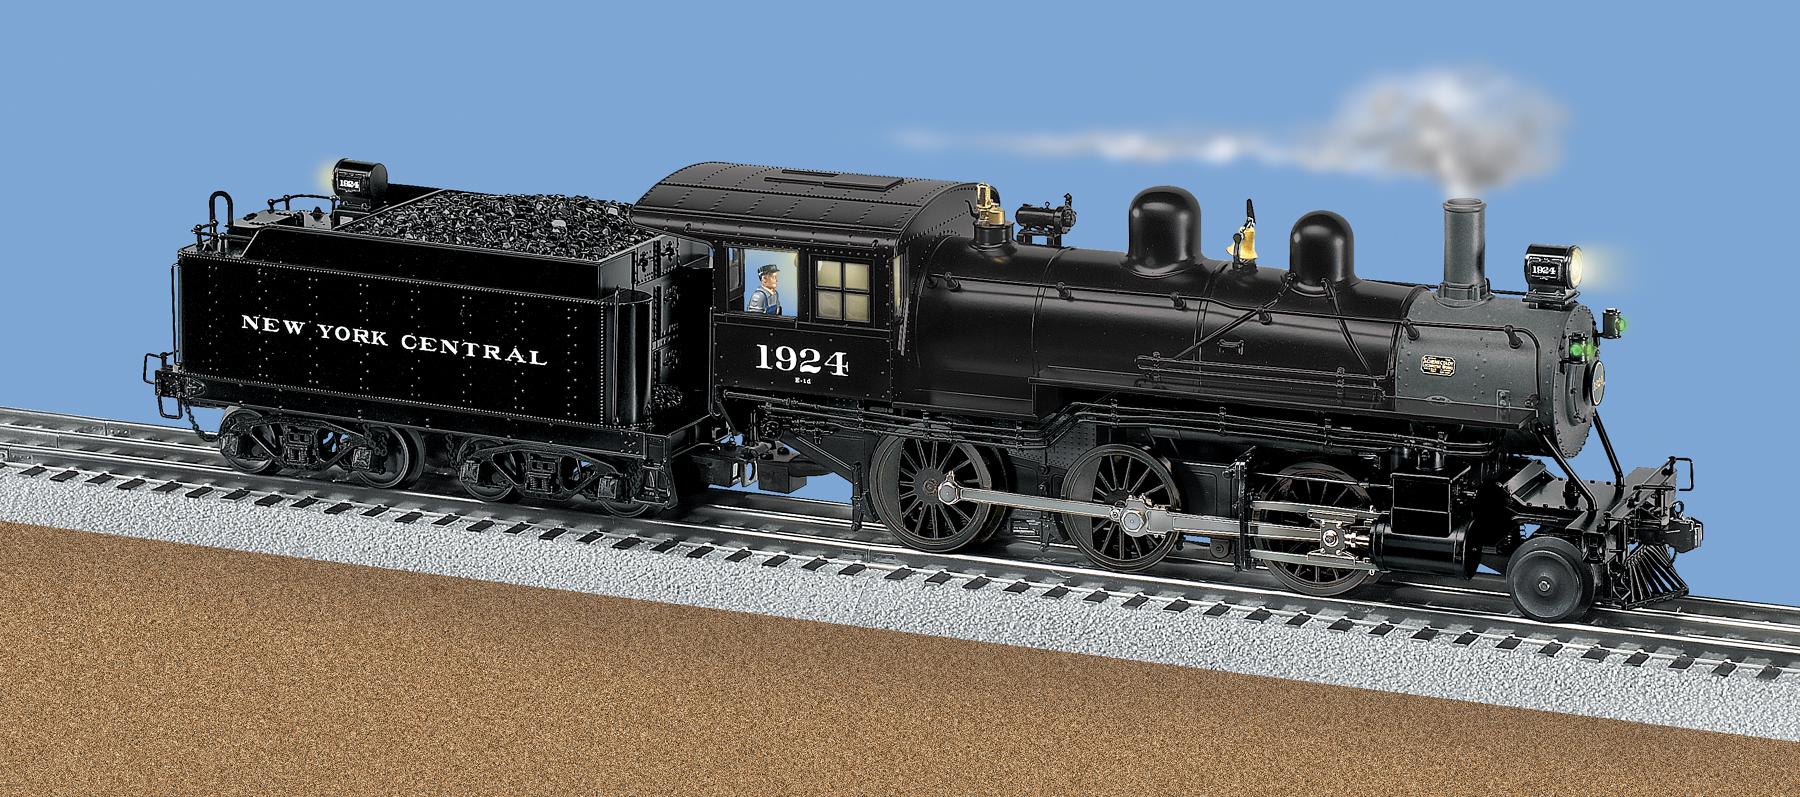 small resolution of new york central tmcc scale 2 6 0 mogul steam locomotive 1924 rh lionel com lionel lionel locomotive wiring diagram